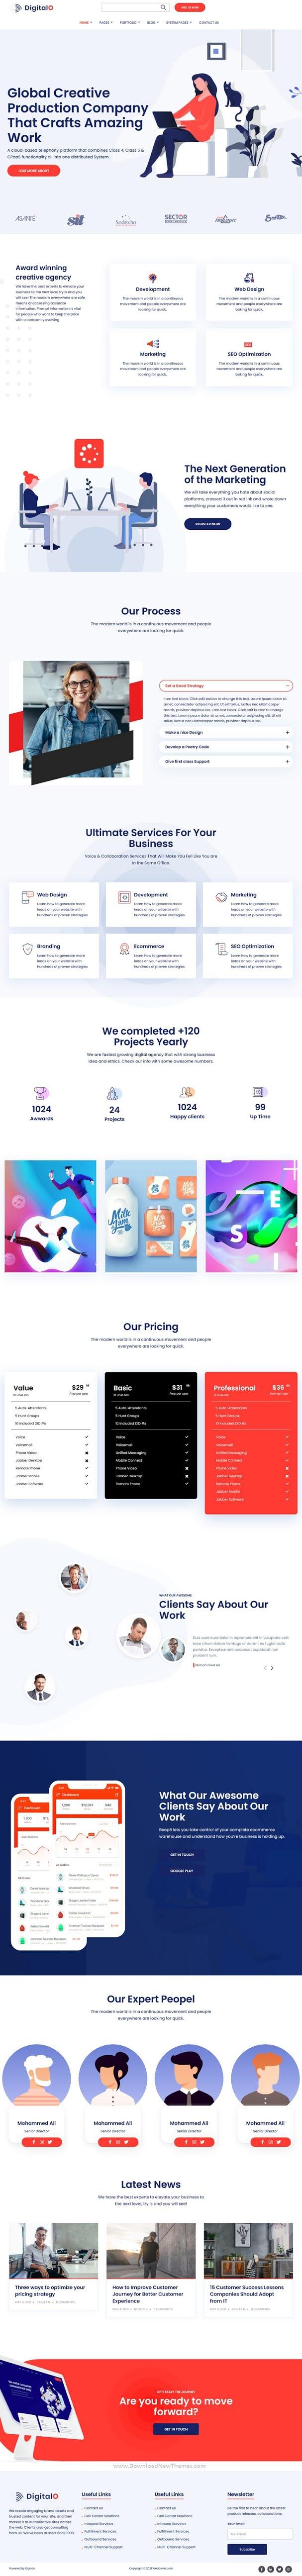 Digital Marketing Strategy Hubspot Theme